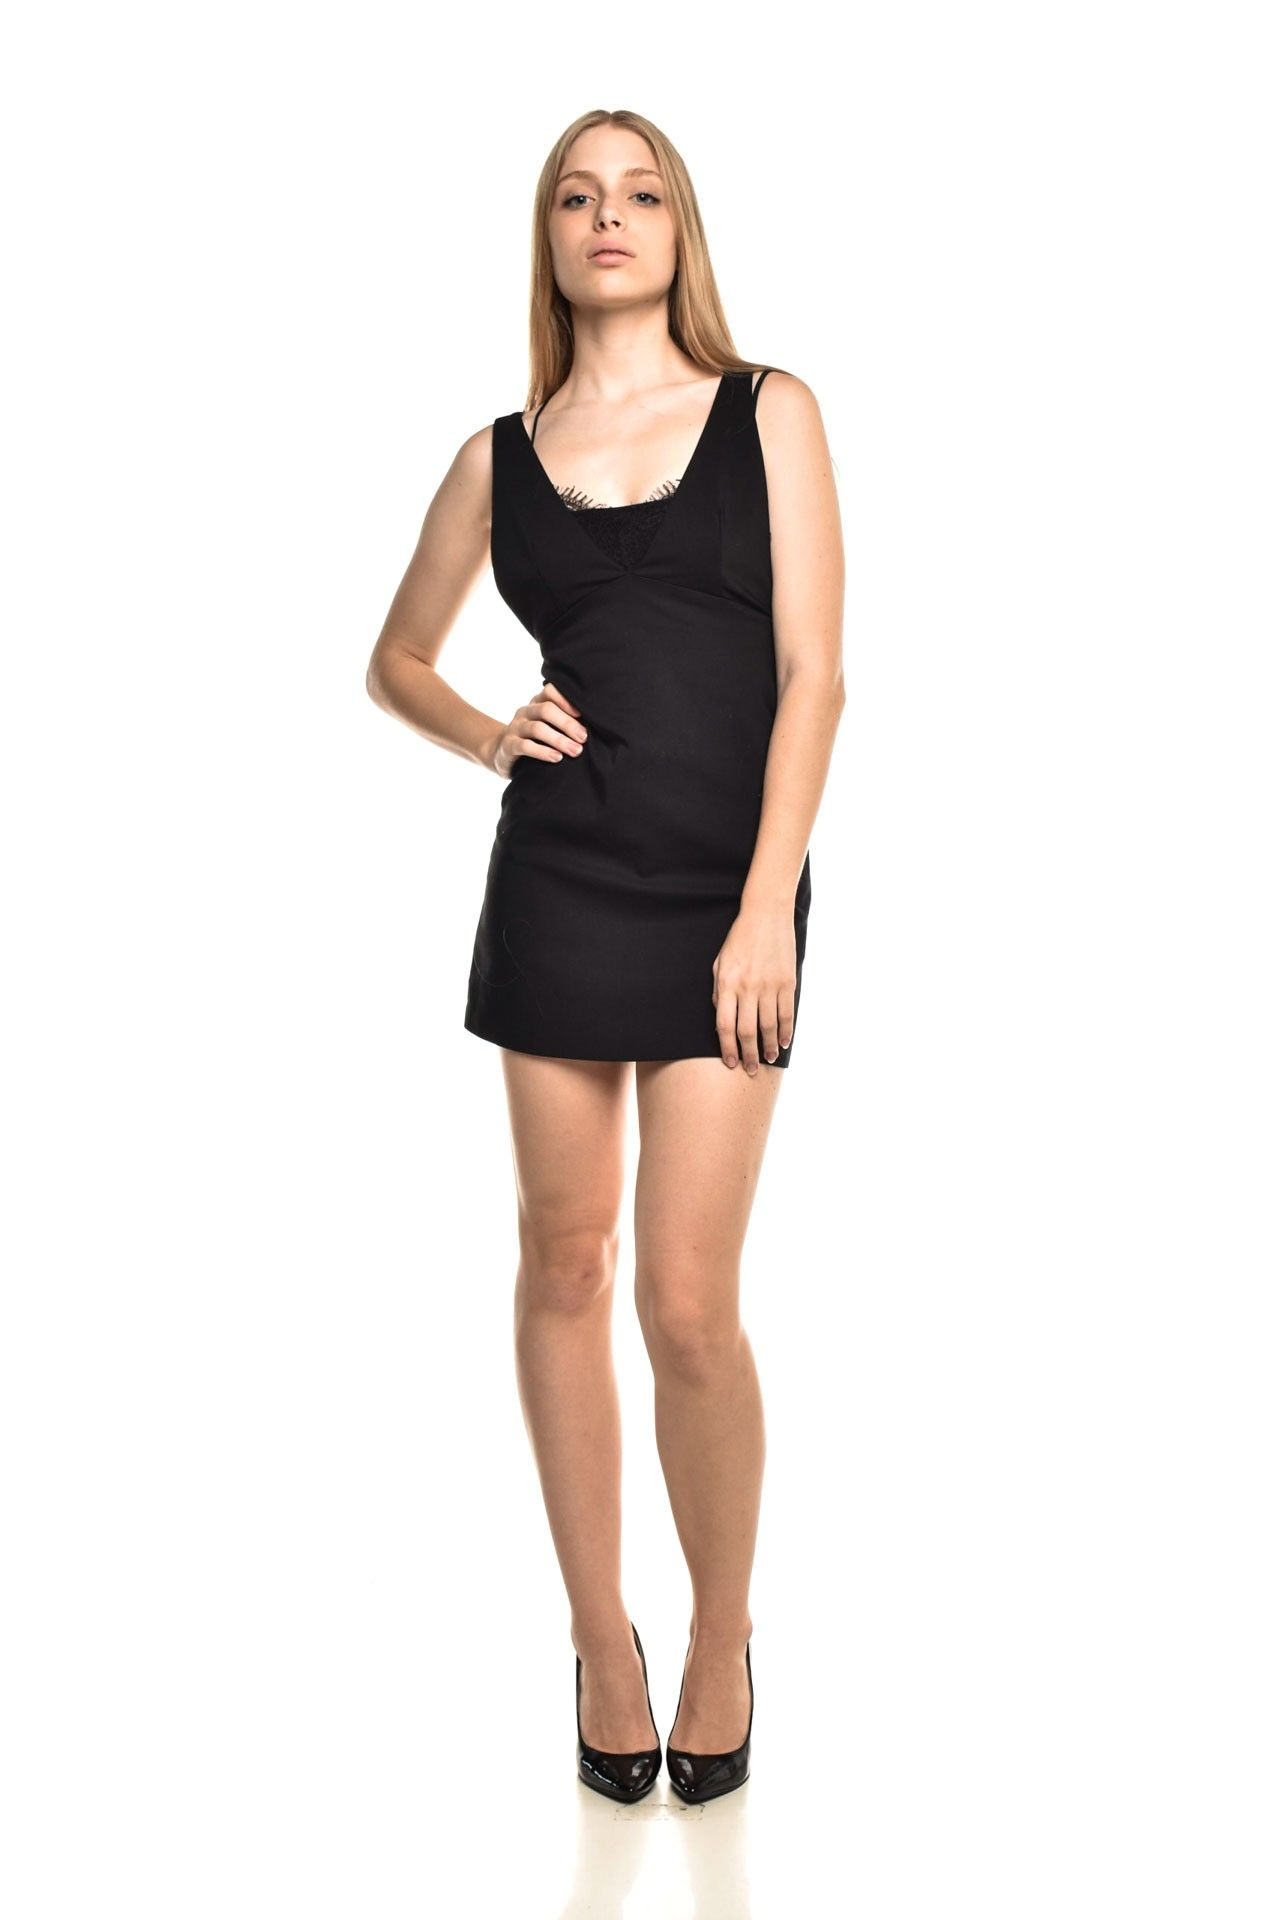 Zara - Vestido Detalhe Renda - Foto 2